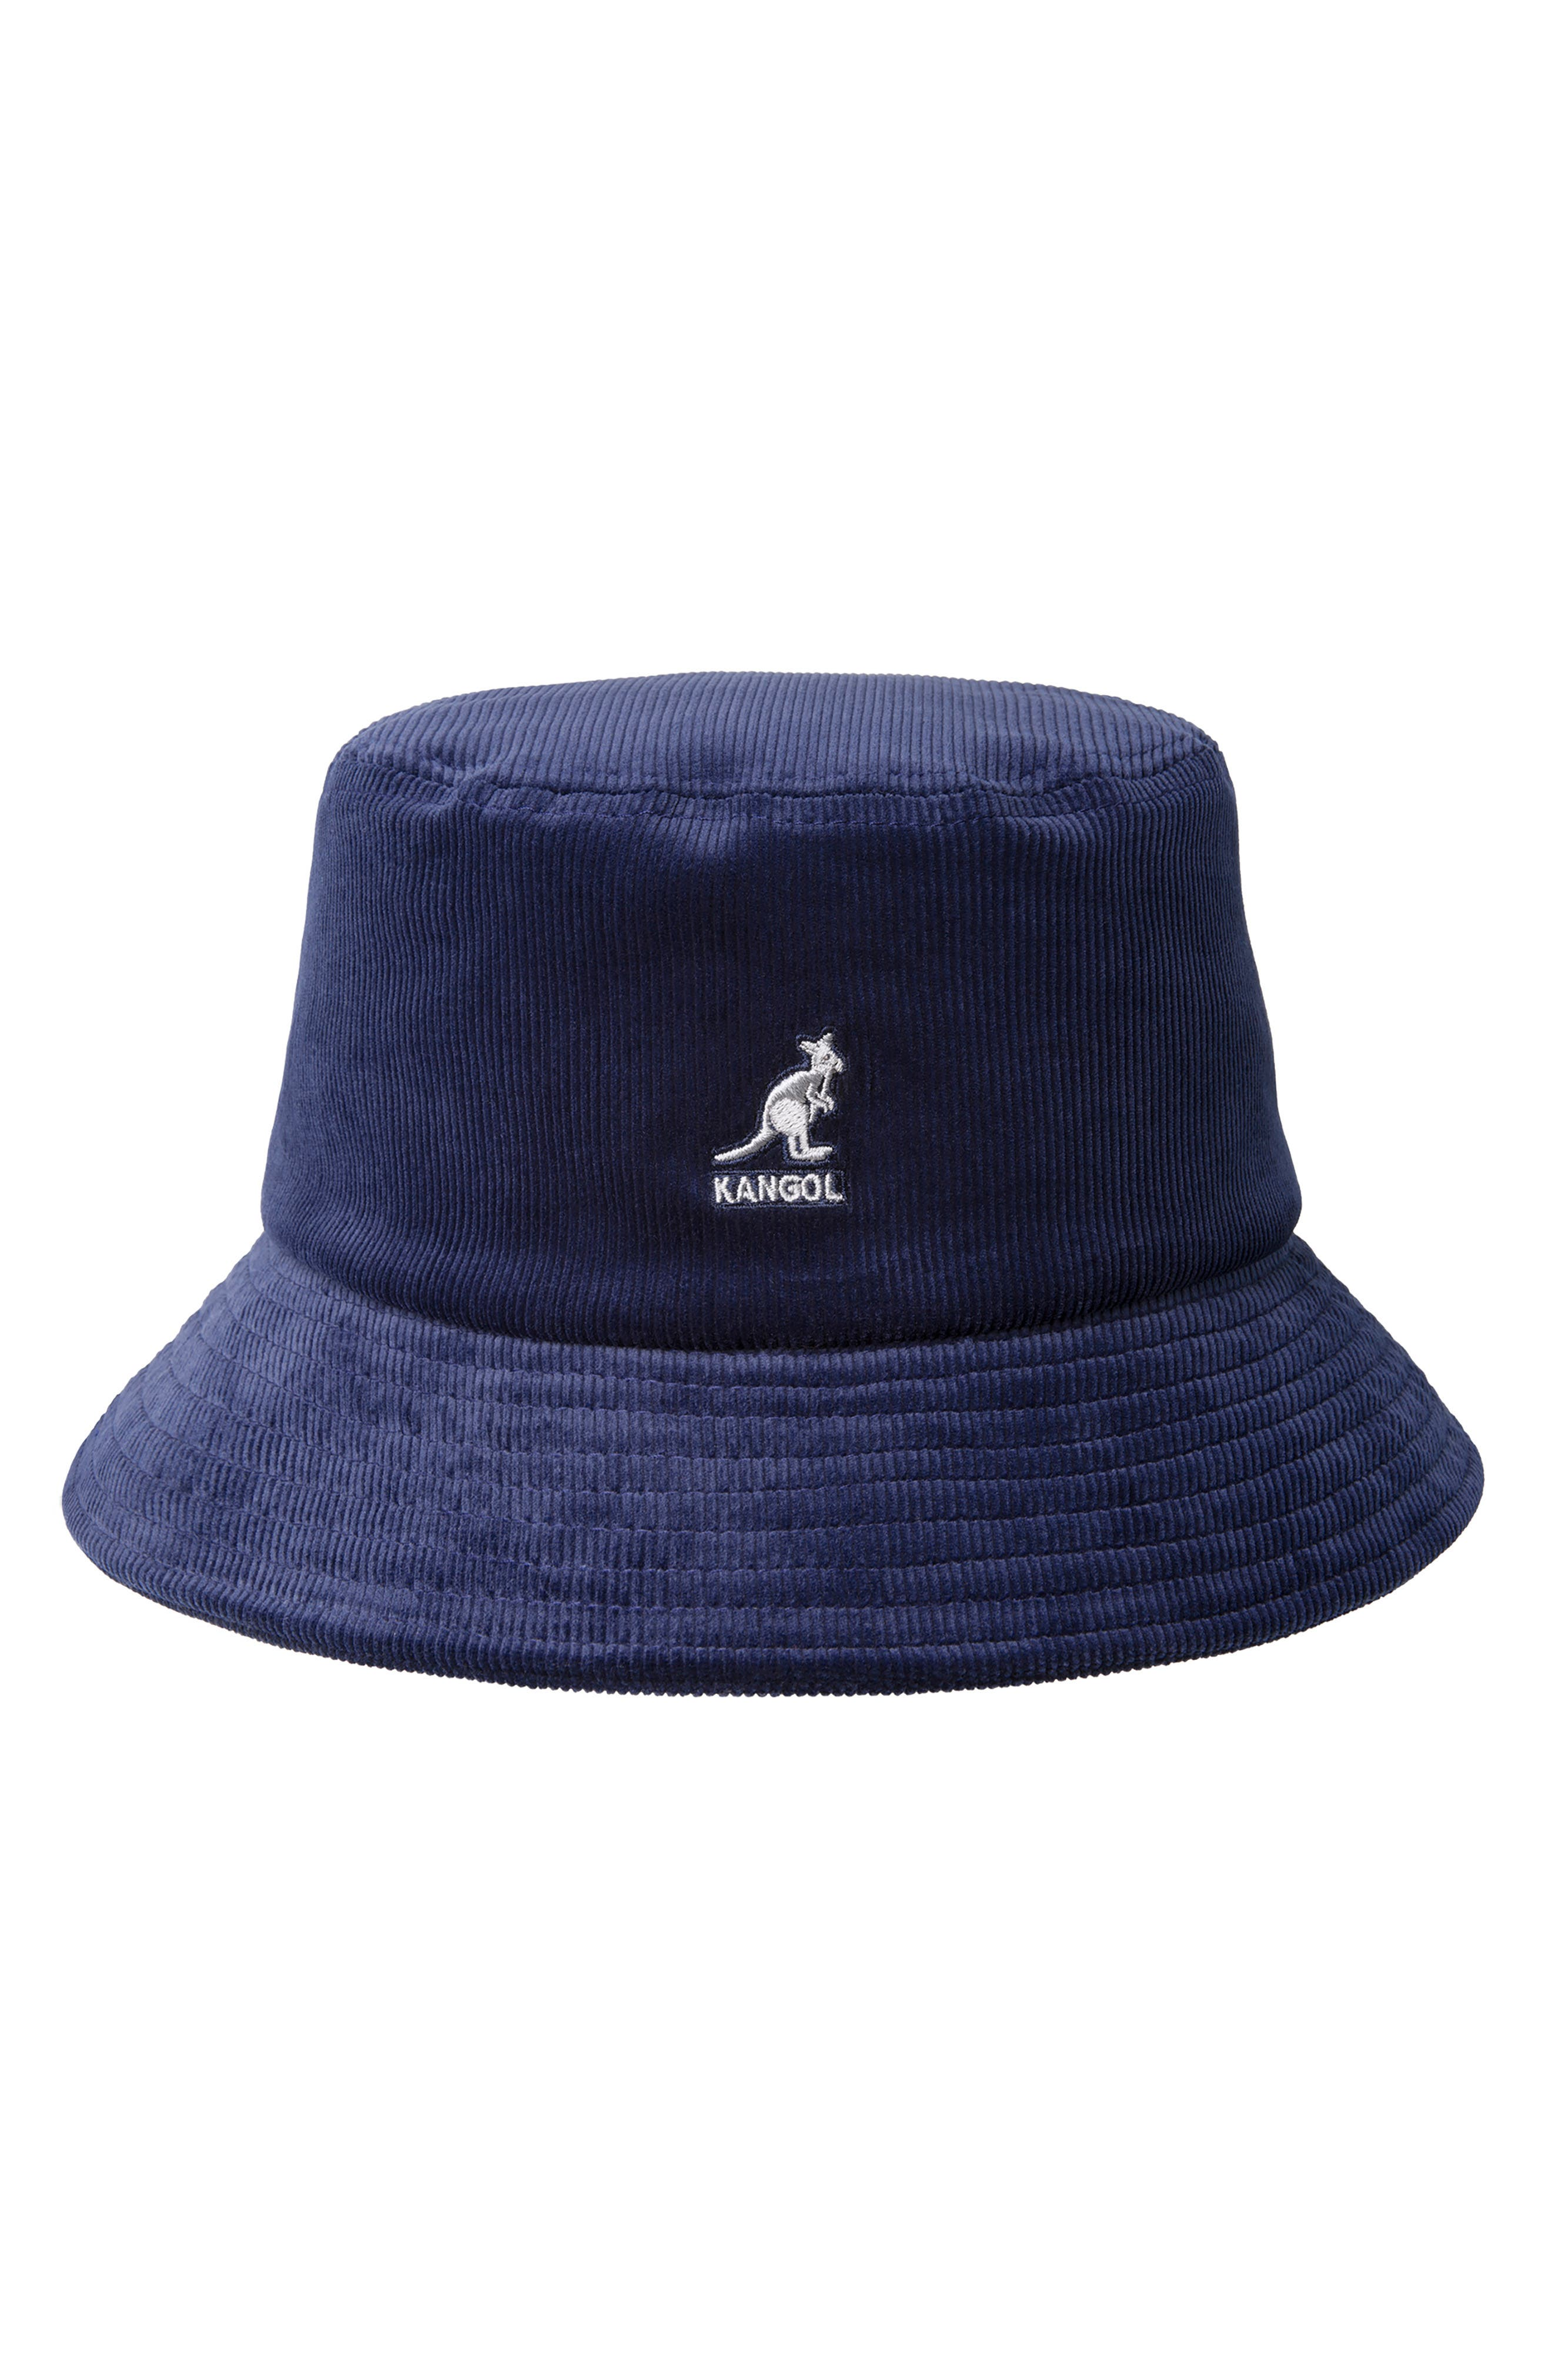 KANGOL Corduroy Bucket Hat - Blue in Navy